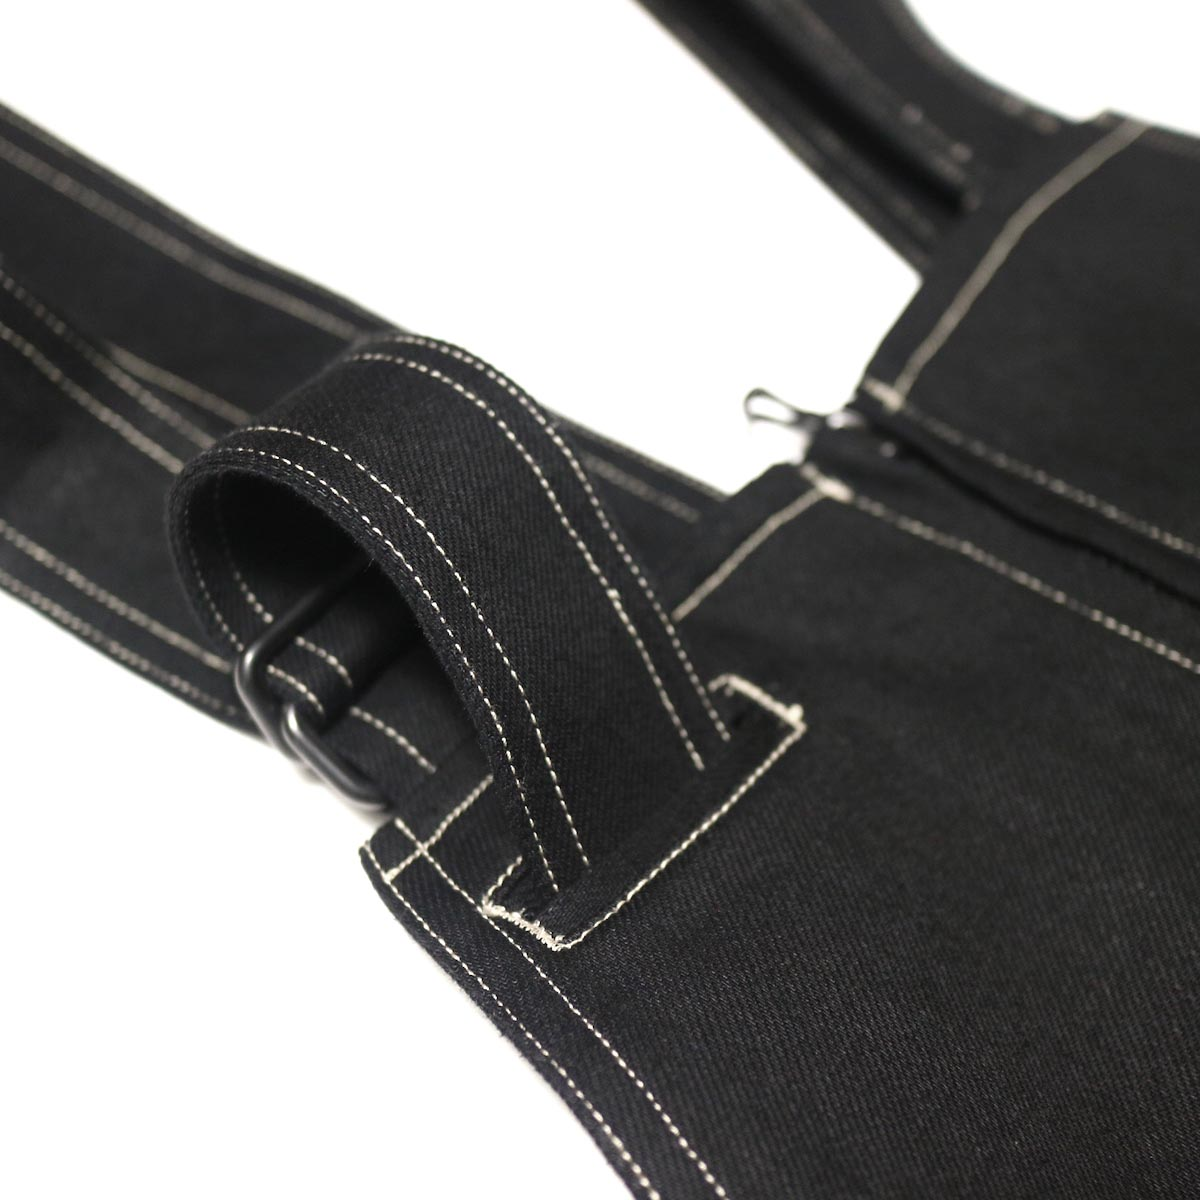 blurhms / U.S Cotton Denim Overalls (Black)ベルト収納